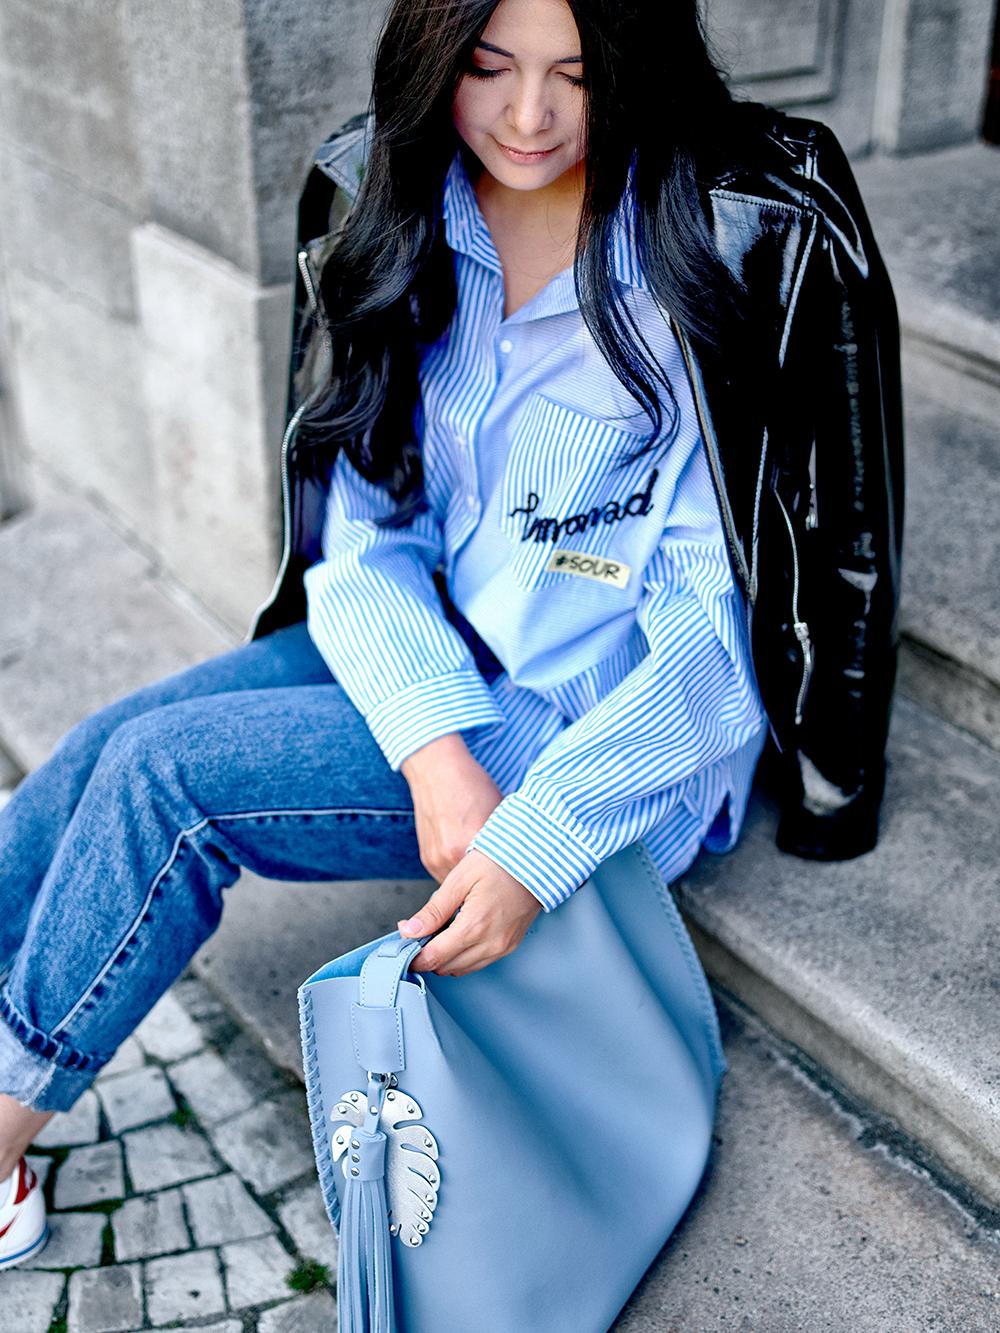 fashionambit-fashionblog-muenchen-modeblog-deutschland-blogger-modeblogger-fashionblogger-bloggerdeutschland-lifestyleblog-munich-style-blog-das-perfekte-foto